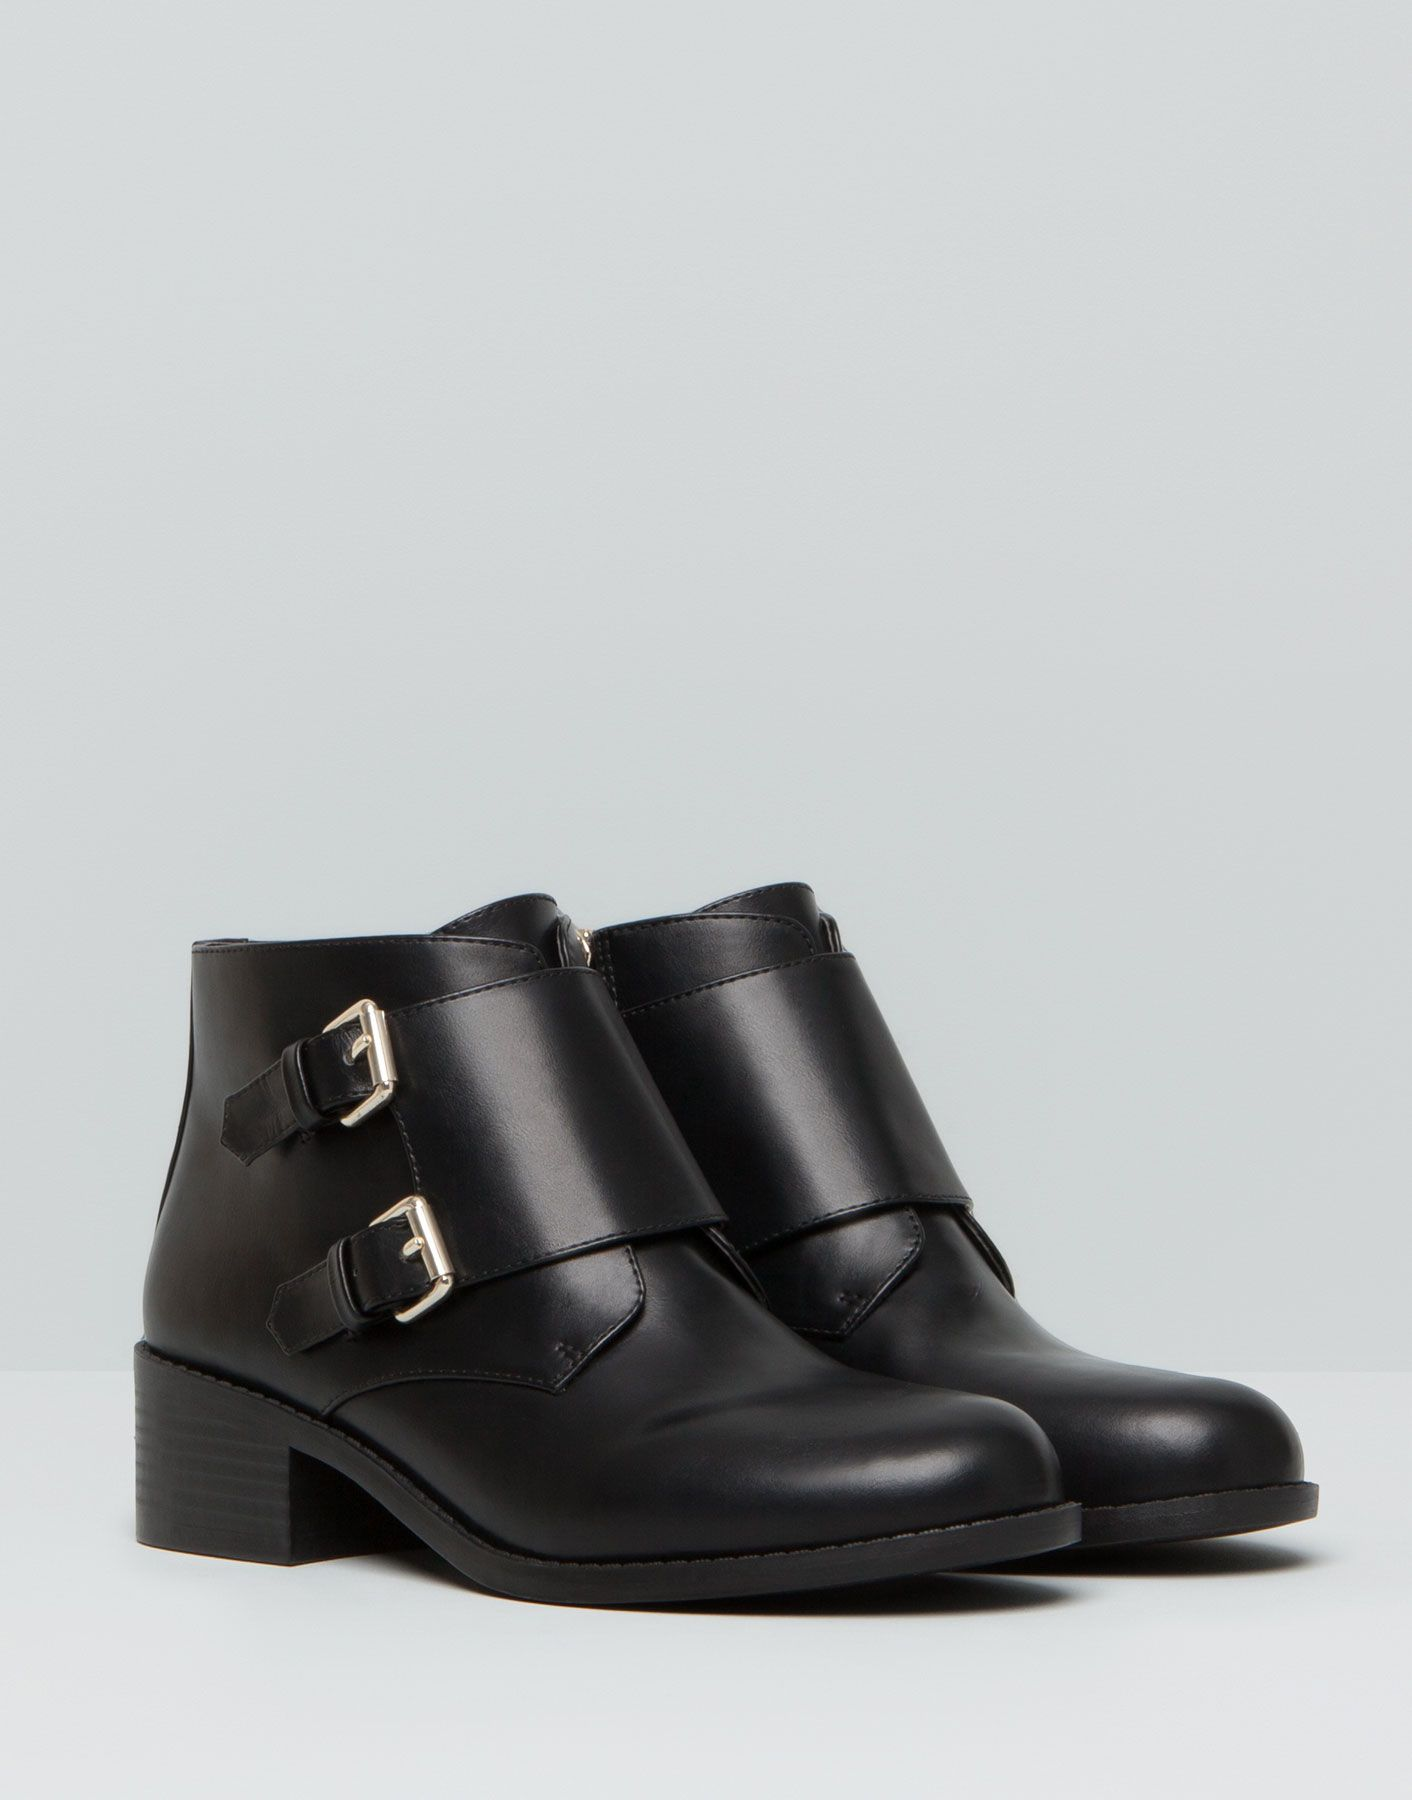 Botin Hebillas Botas Y Botines Zapatos Pull Bear Espana Boots Short Boots Women Shoes